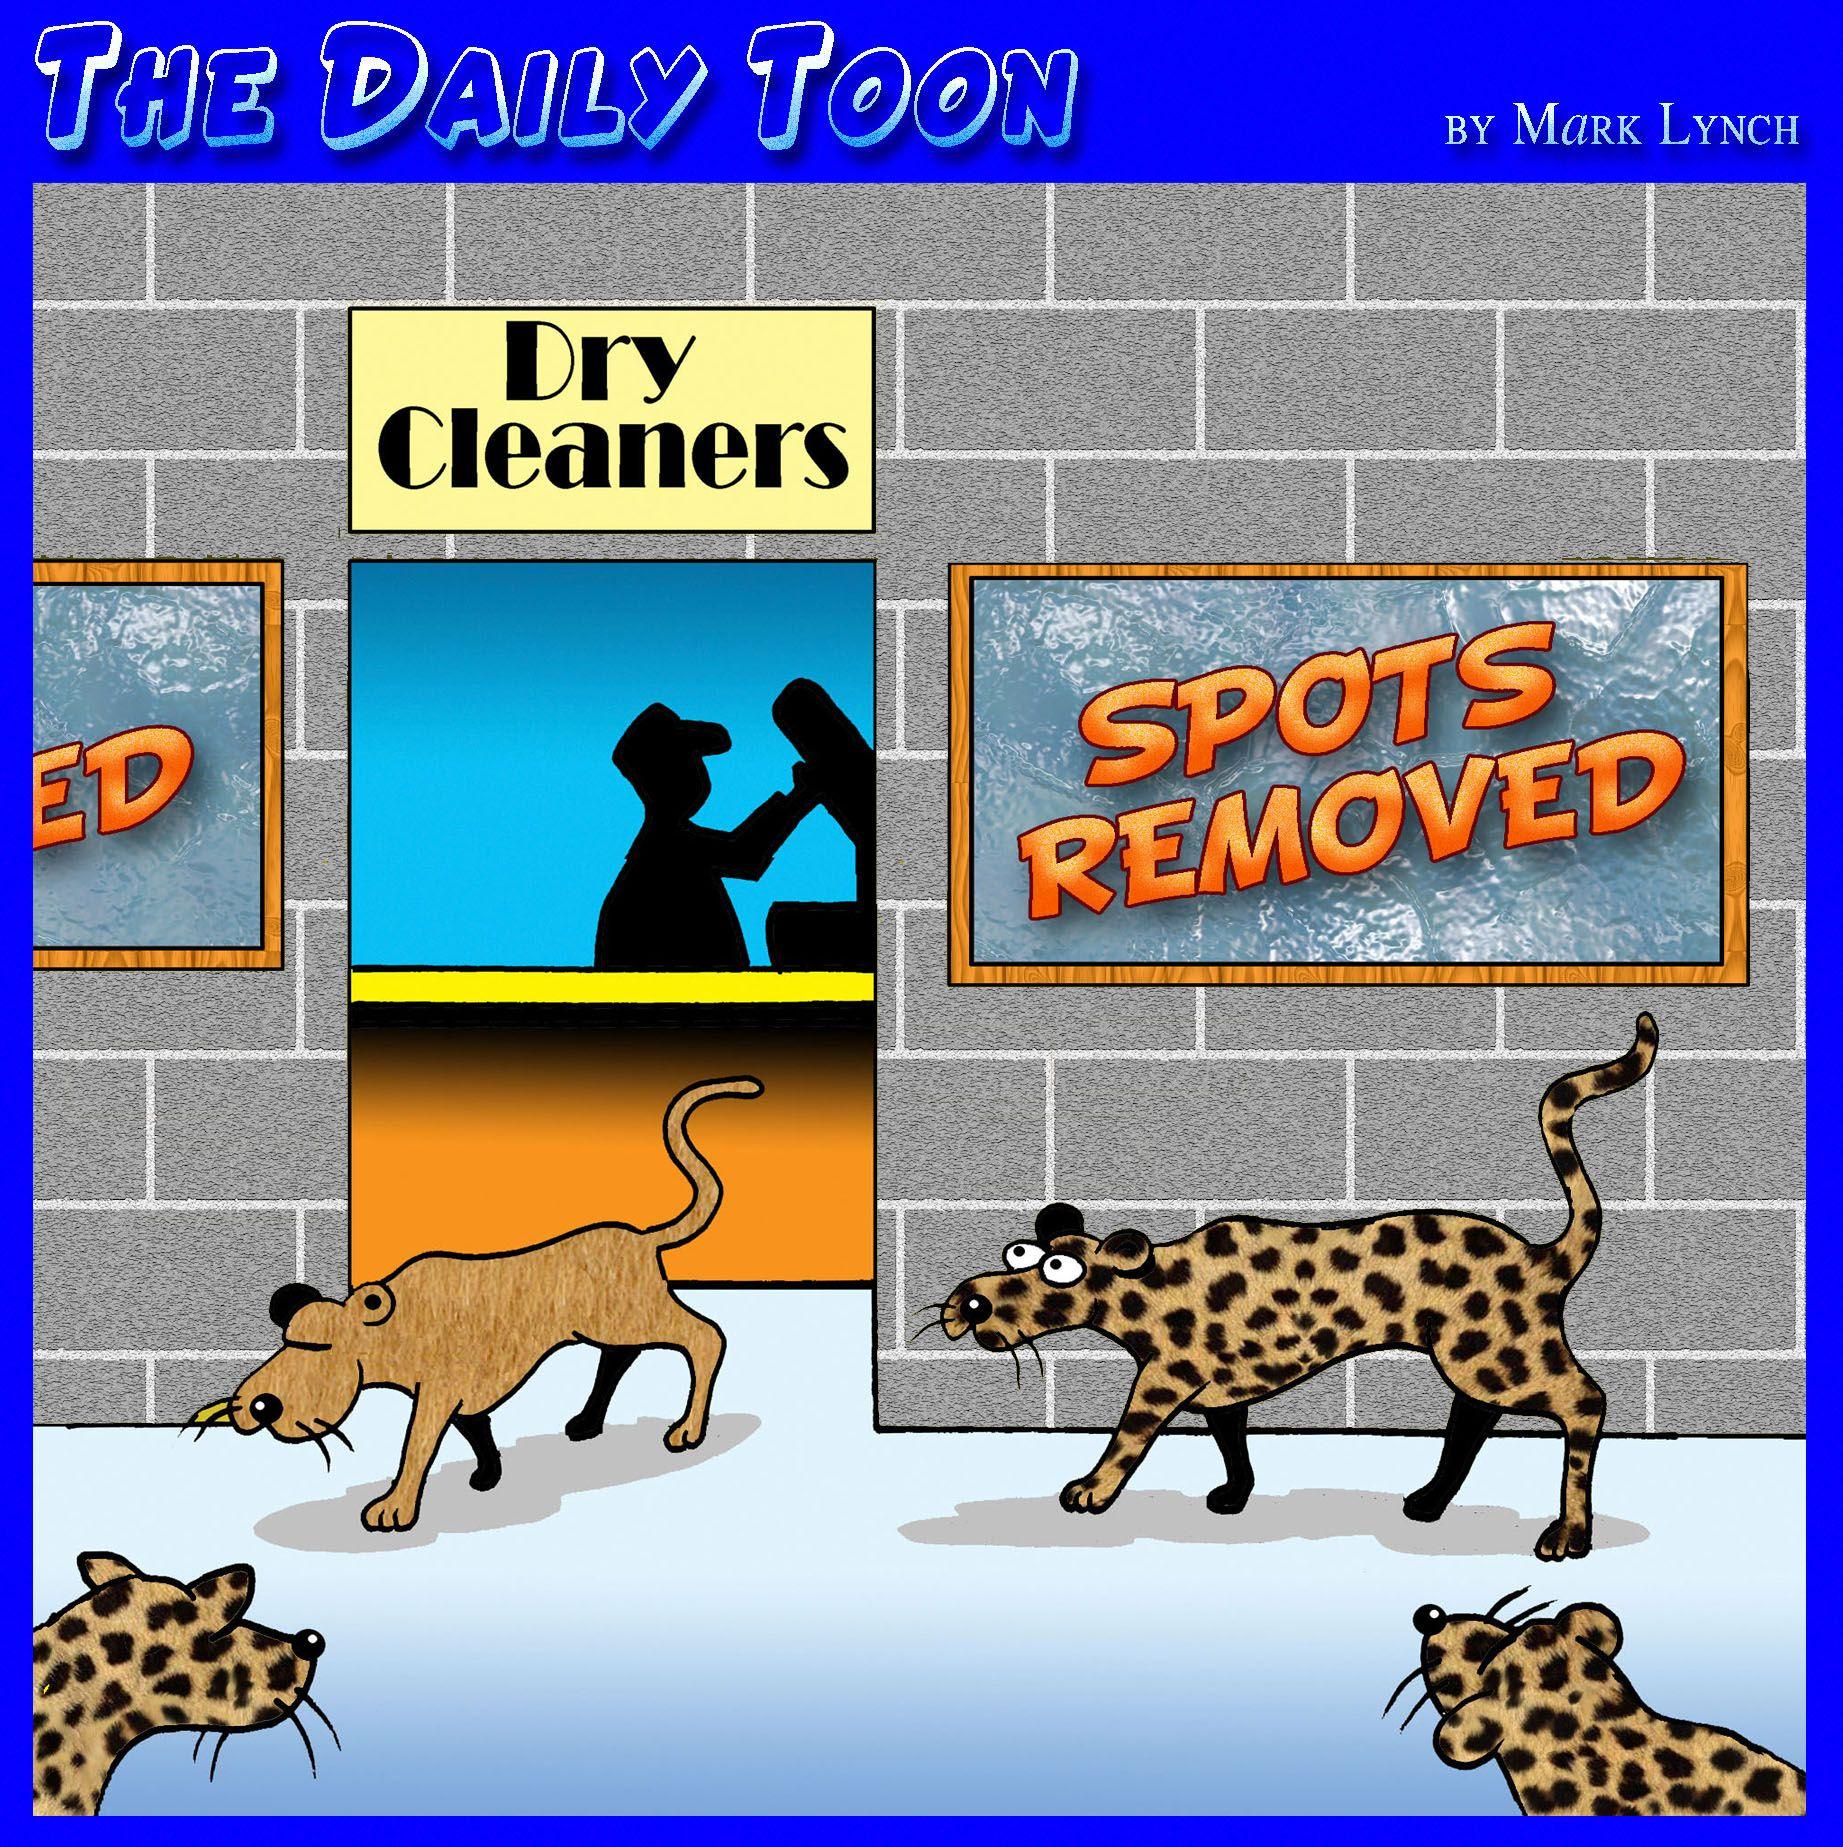 Leopard Changing It S Spots Cartoon Stupid Jokes Daily Cartoon Funny